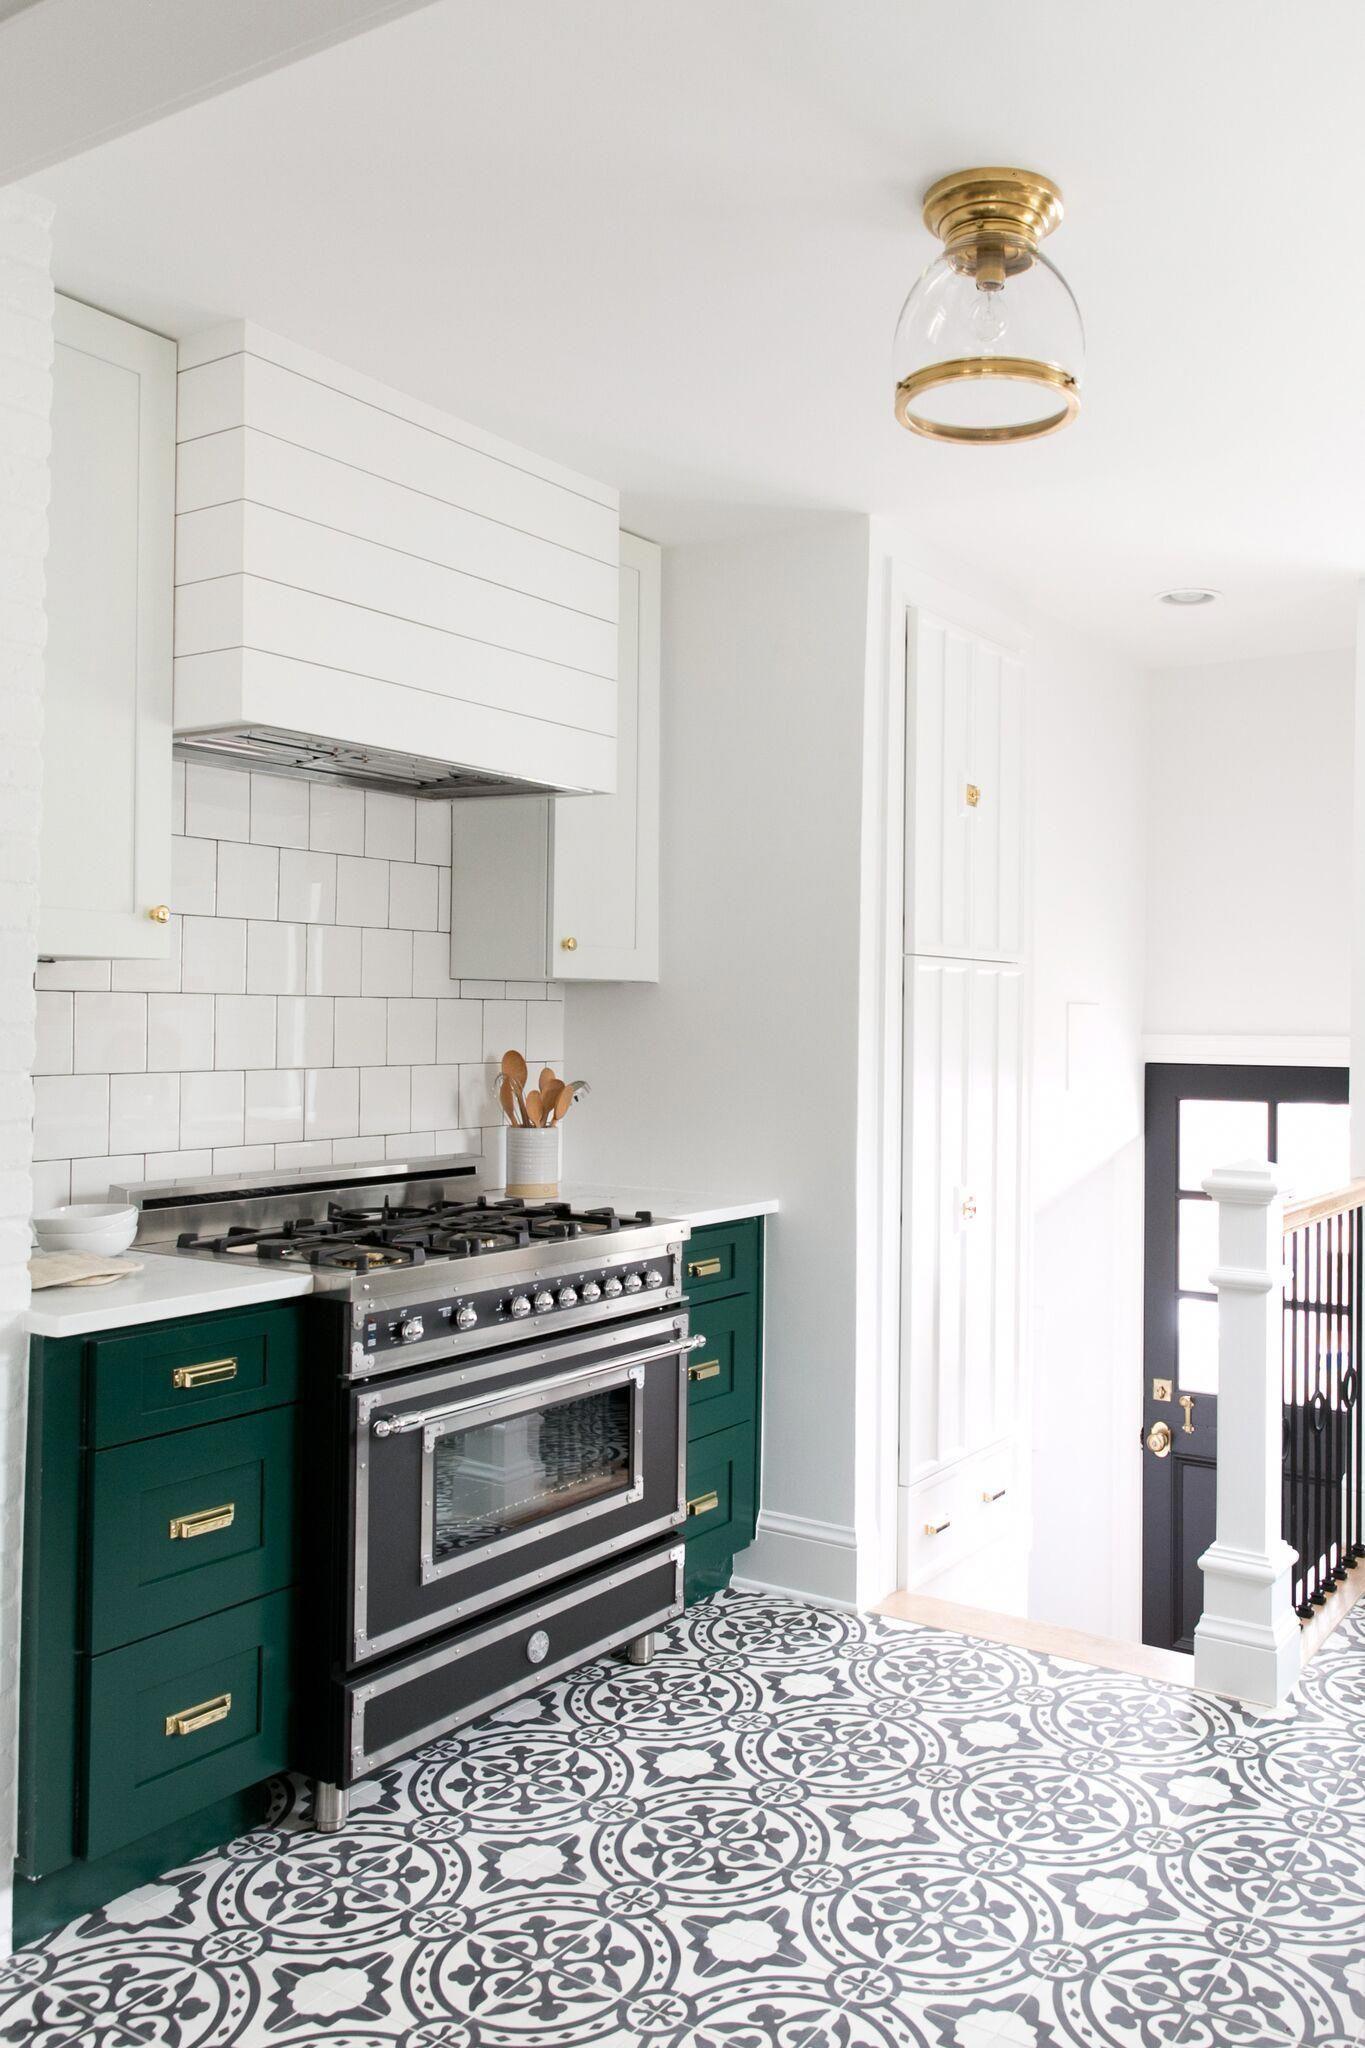 Patterned Tiled Floors and Green Denver Tudor